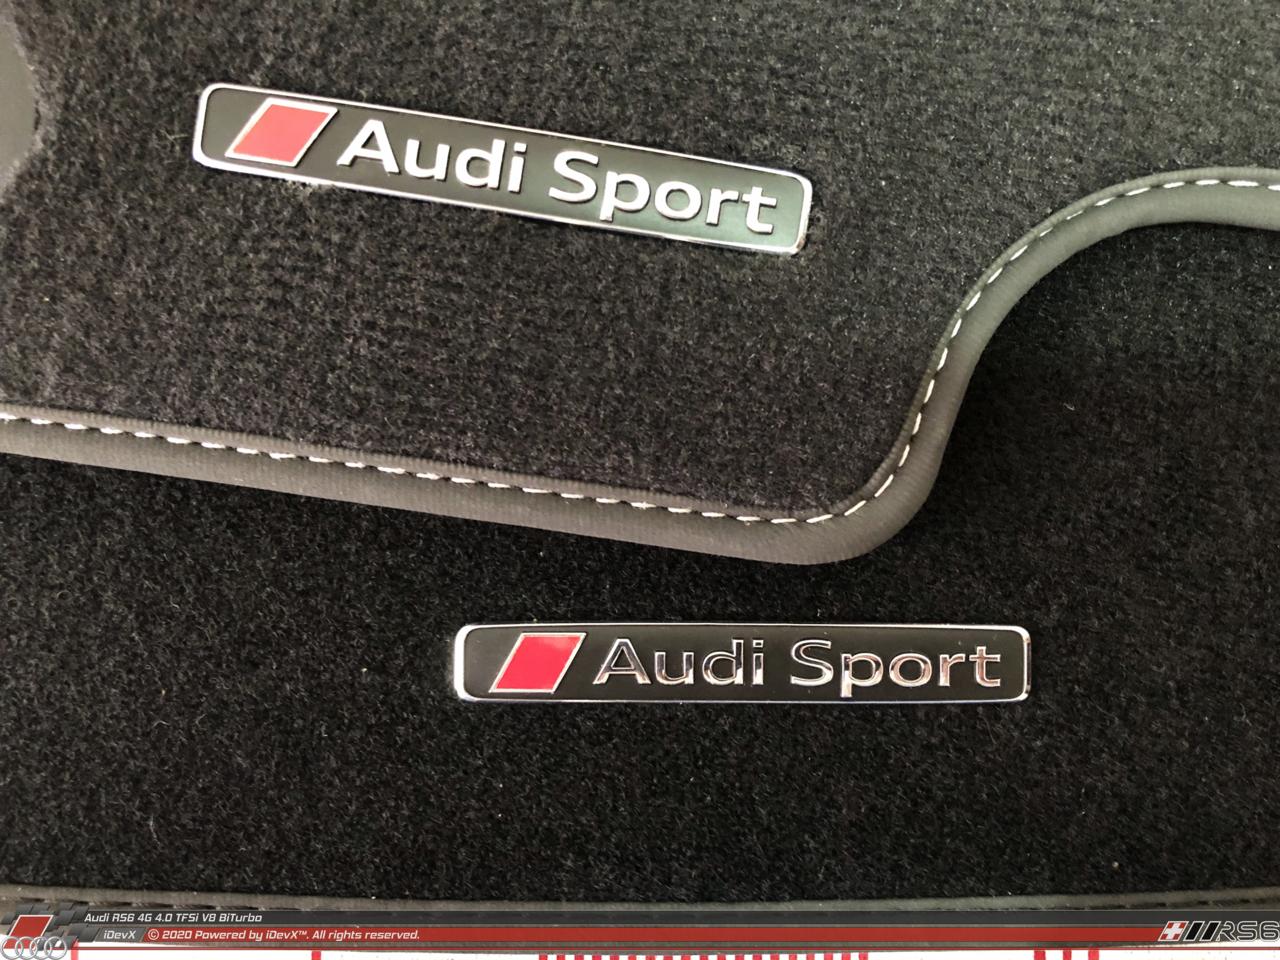 15_08.2019_Audi-RS6_iDevX_012.png